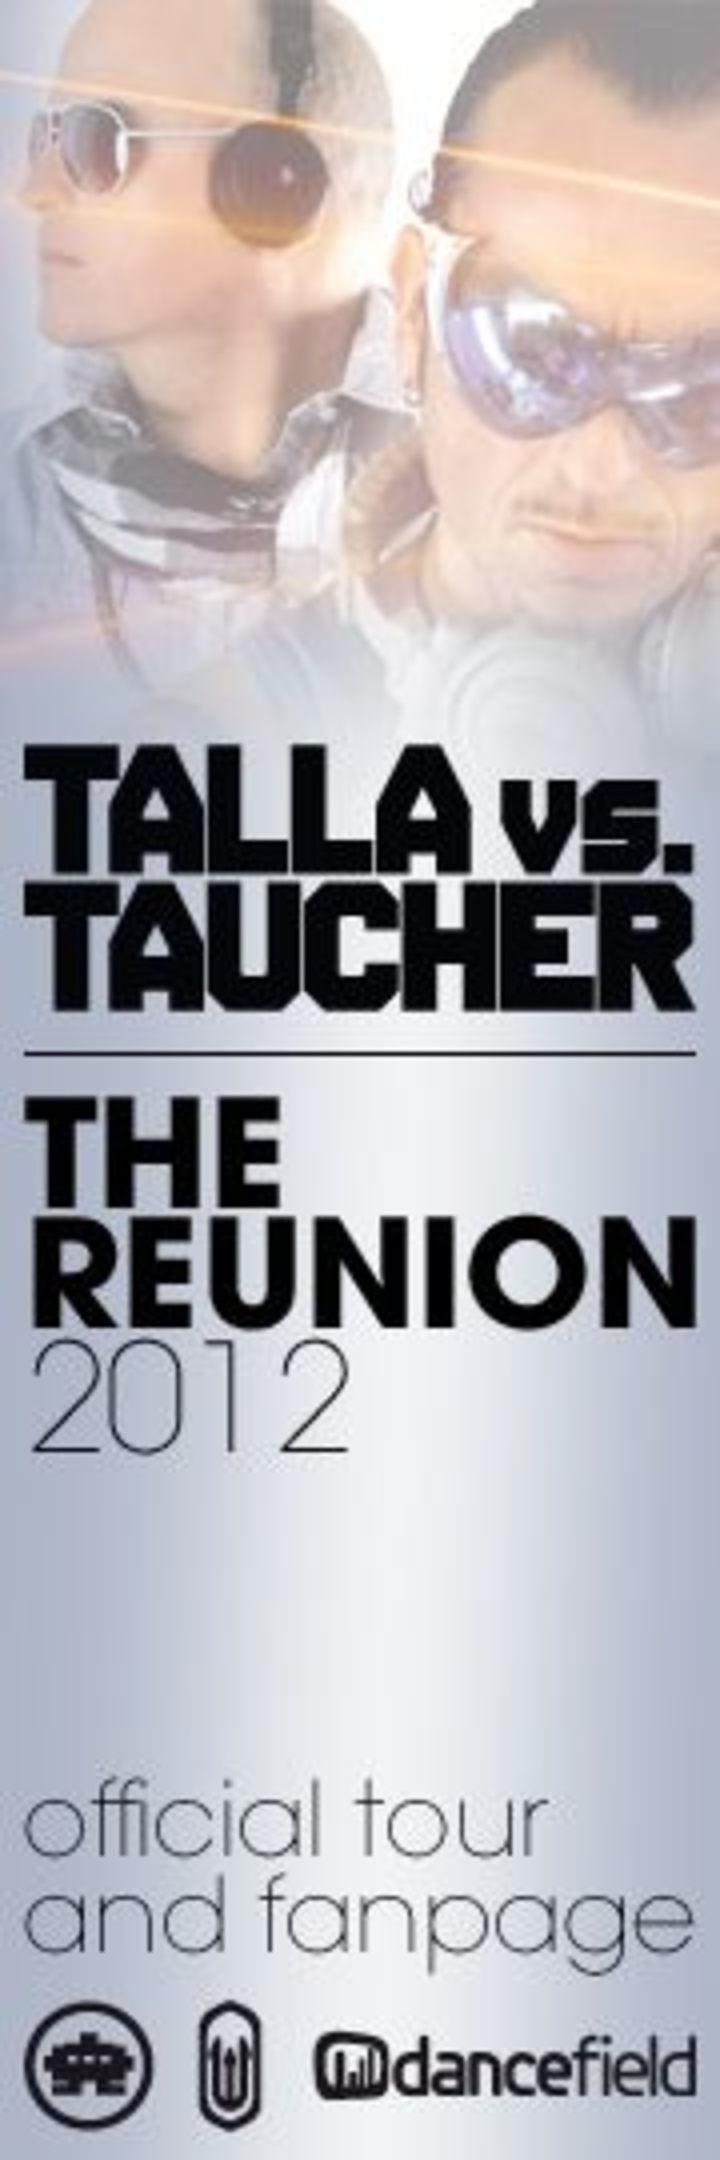 Talla vs Taucher the reunion 2012 Tour Dates